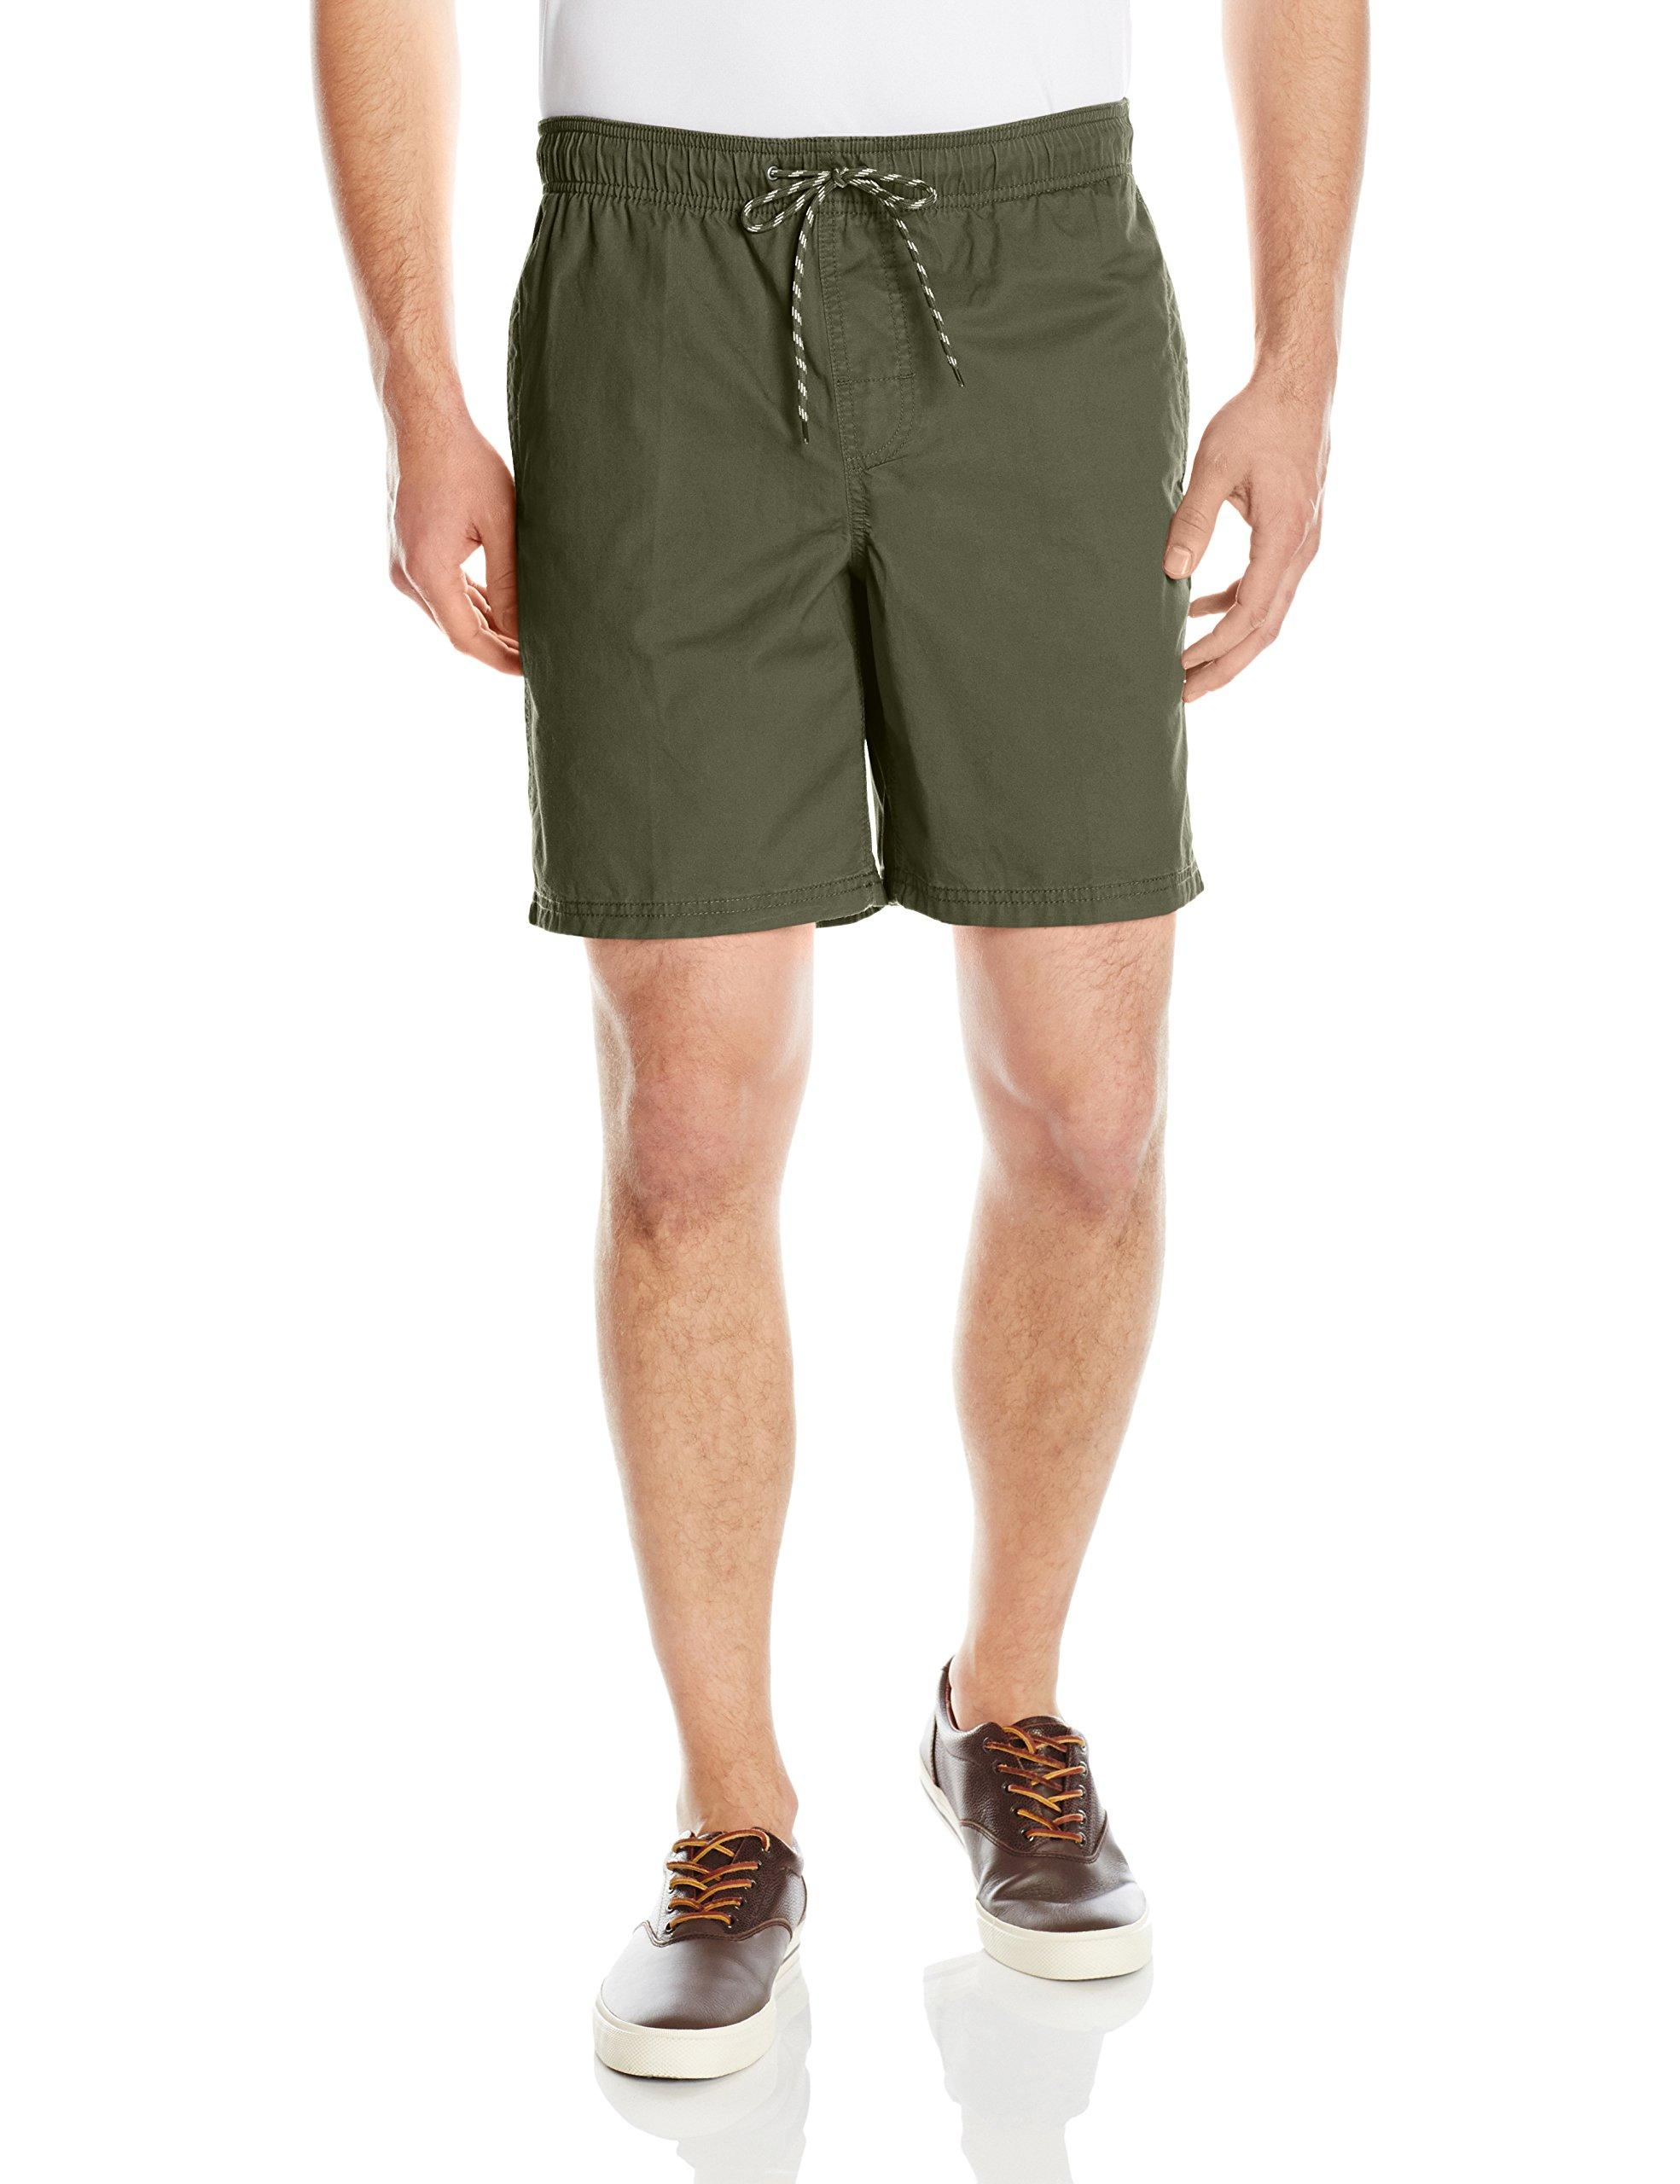 Amazon Essentials Men's Drawstring Walk Short, Olive, Medium